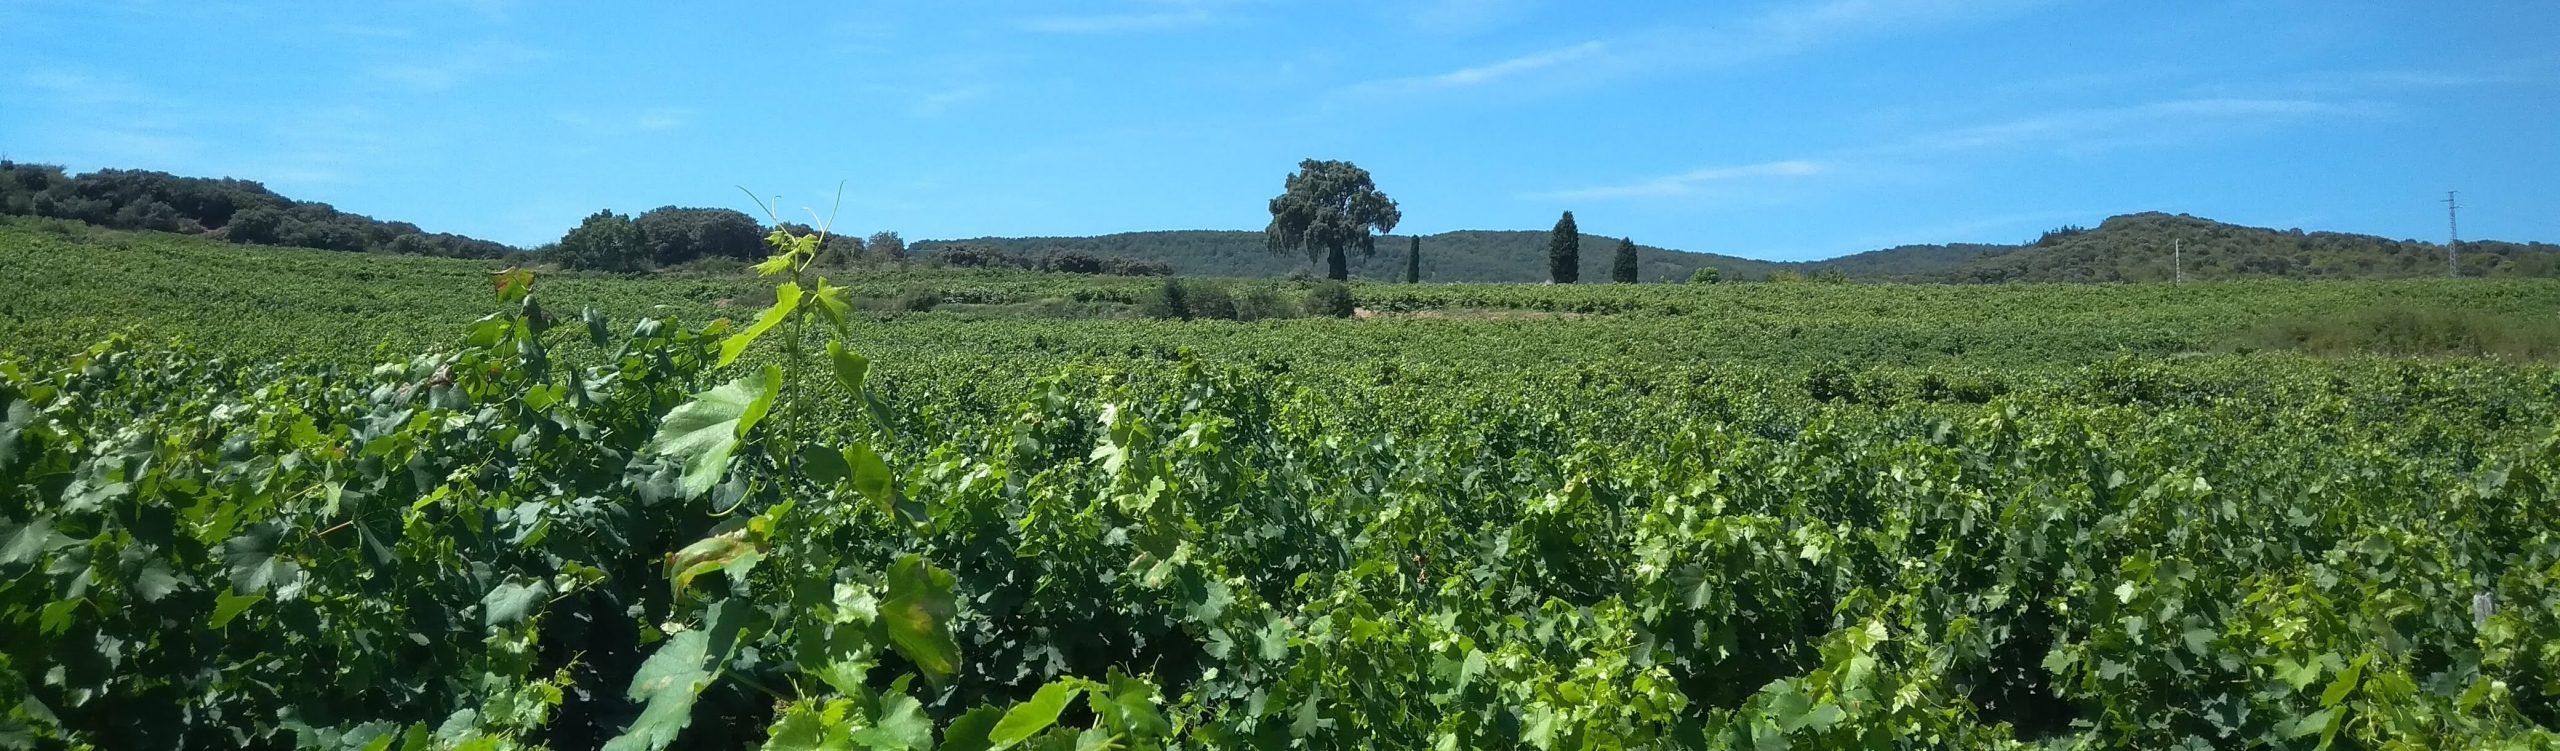 Bodega Y Vinedos Hija De Anibal Blue Sky Vineyards